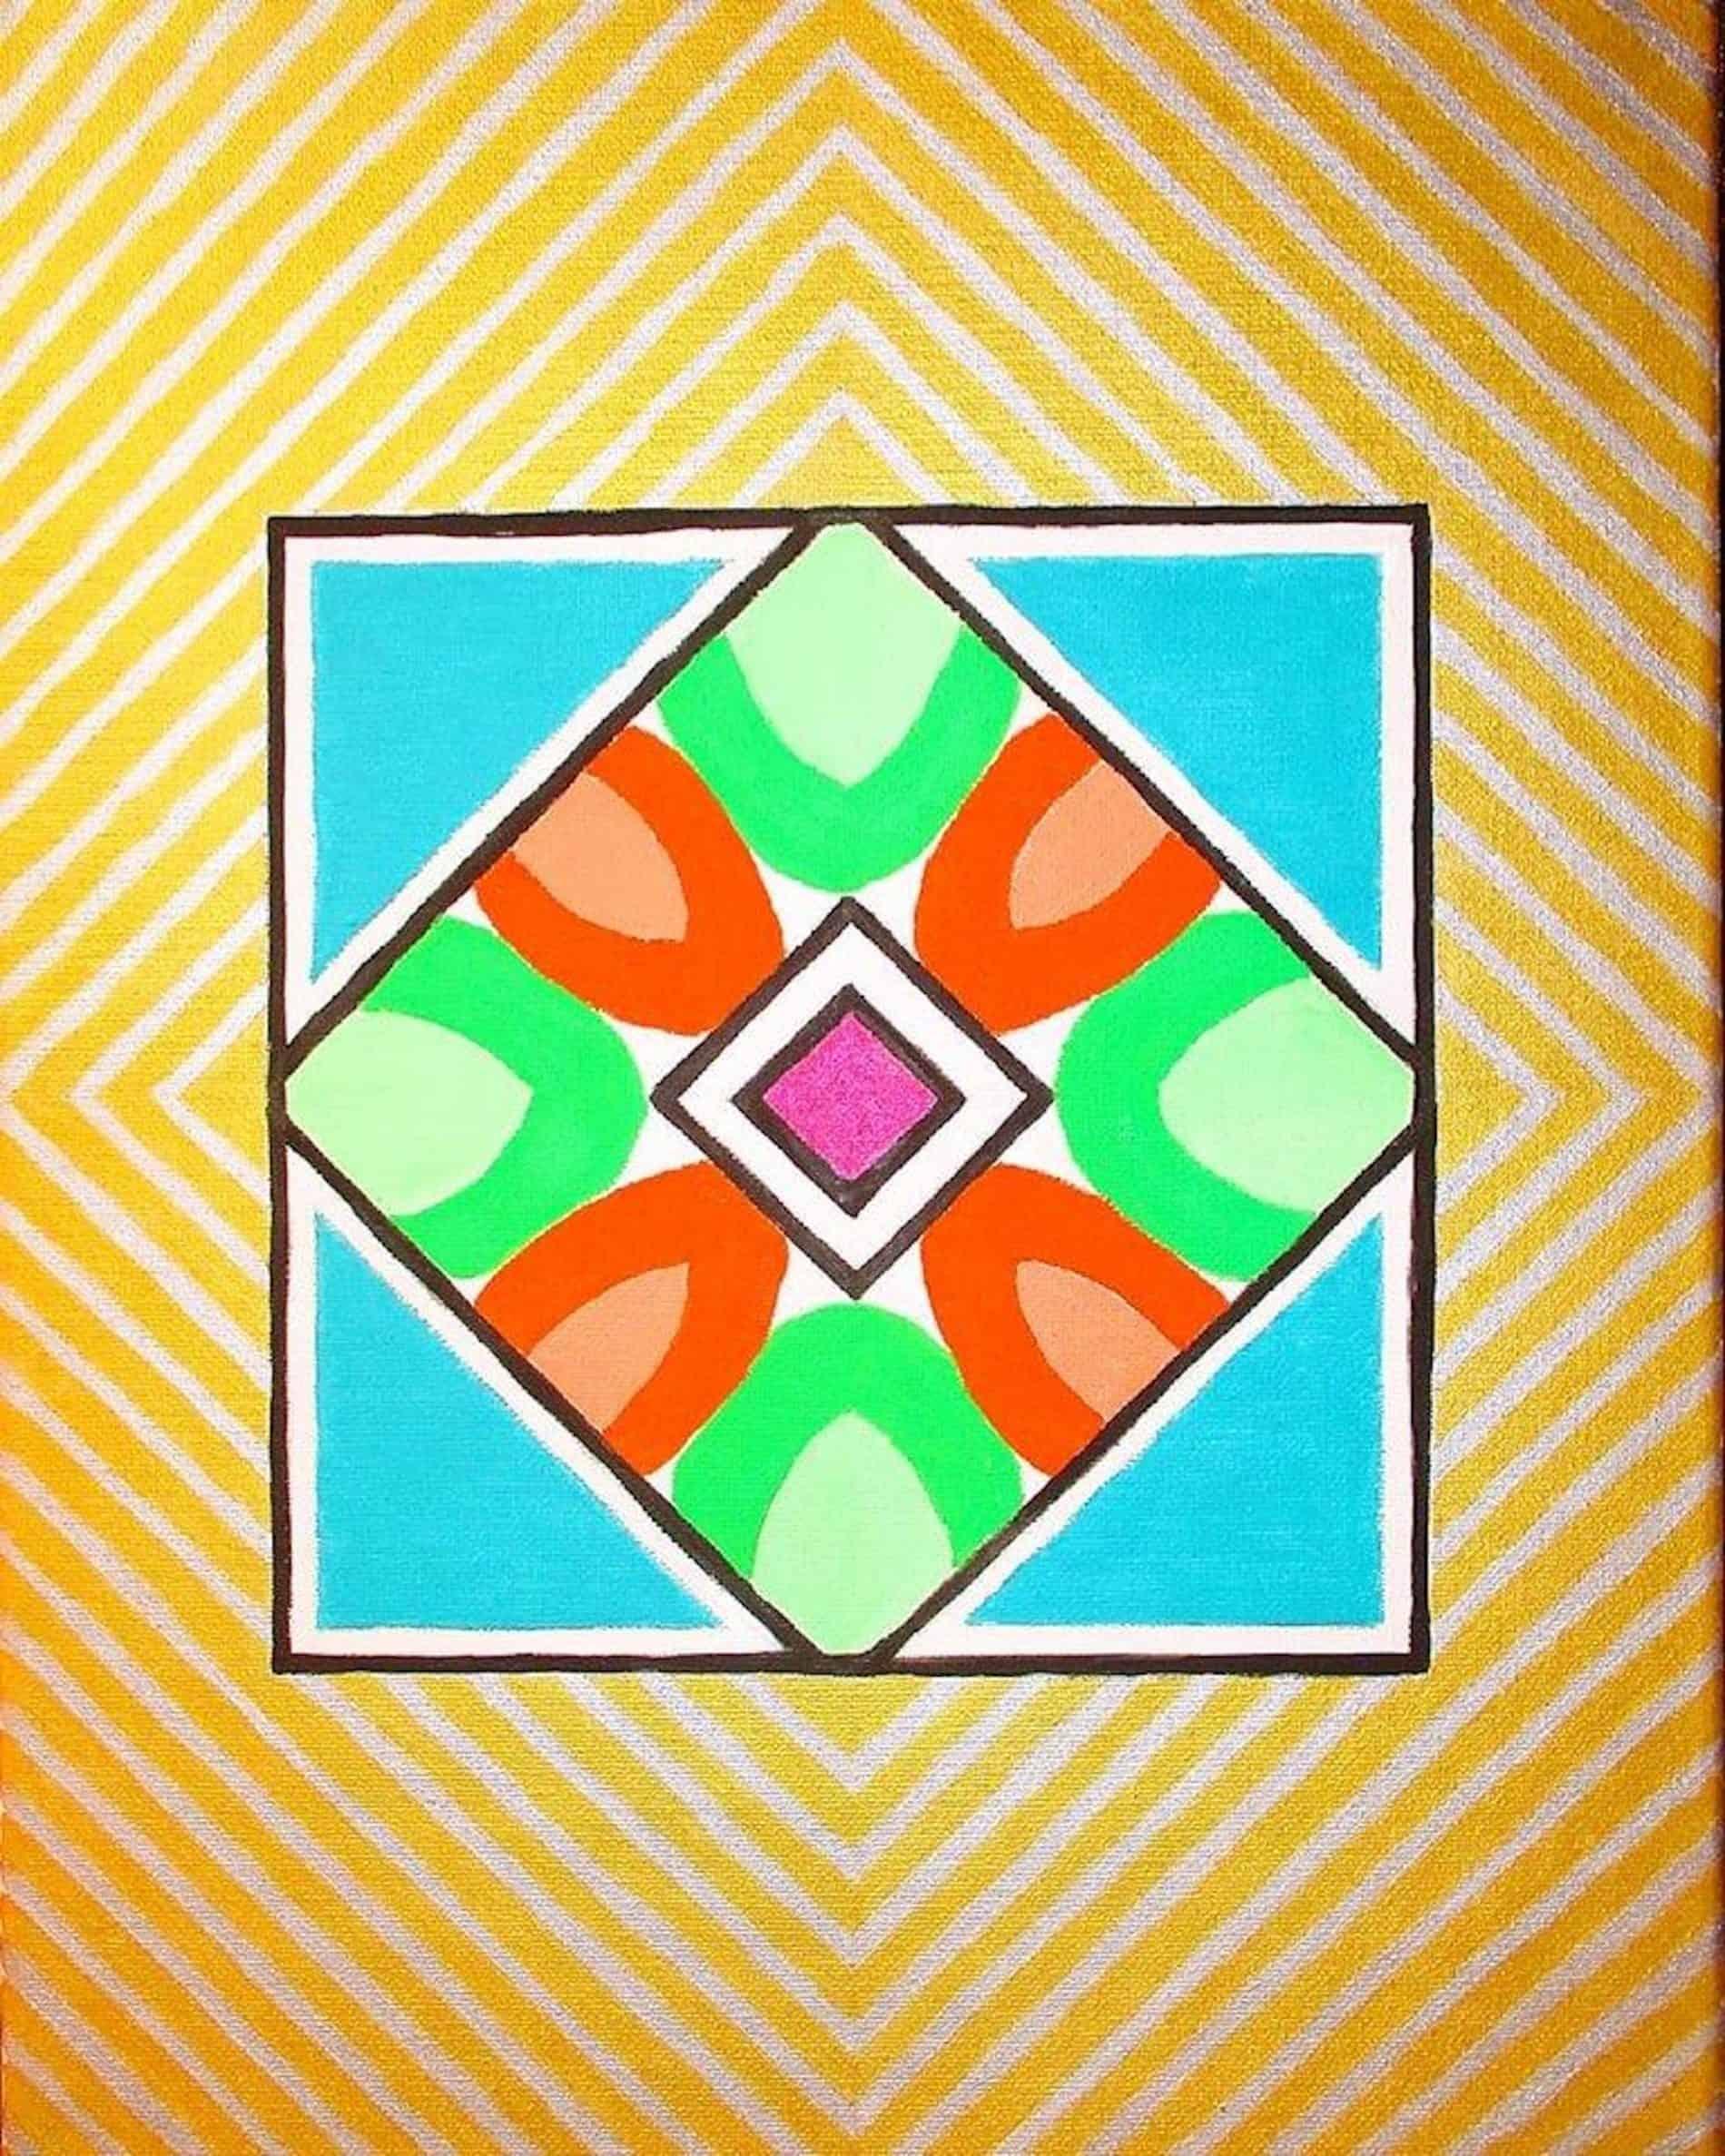 mauritius-arts-sarvesh-unuth-1